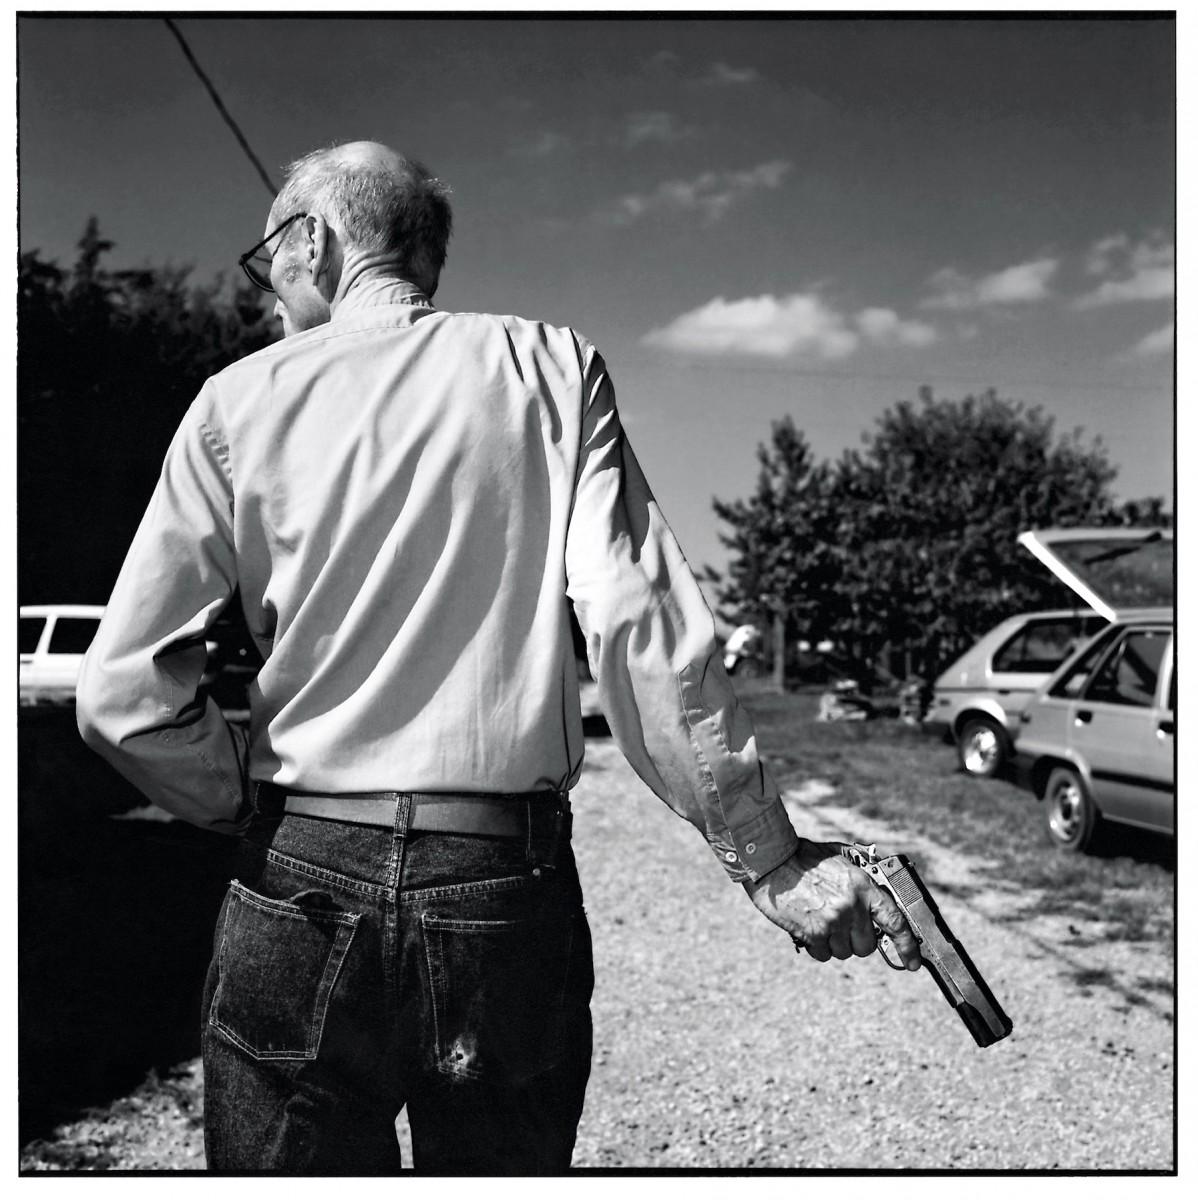 William Burroughs, Lawrence/Kansas 1987